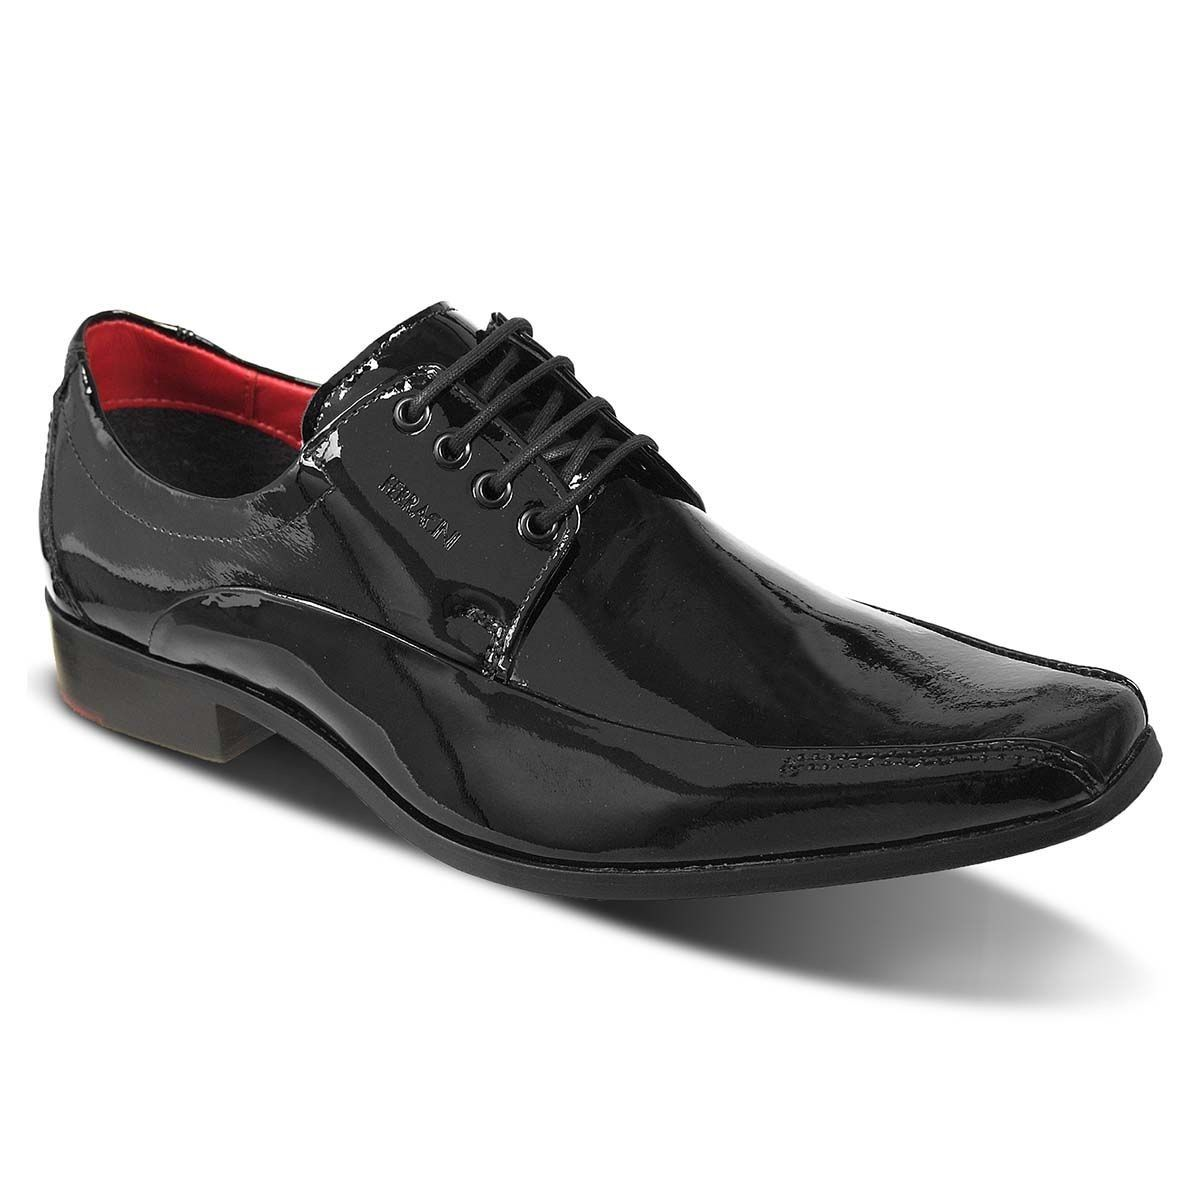 e29fbefcb Sapato Londres Pre 2810-223H Tipo: Derby Cor: Verniz Preto Estilo: Social  Marca: Ferracini